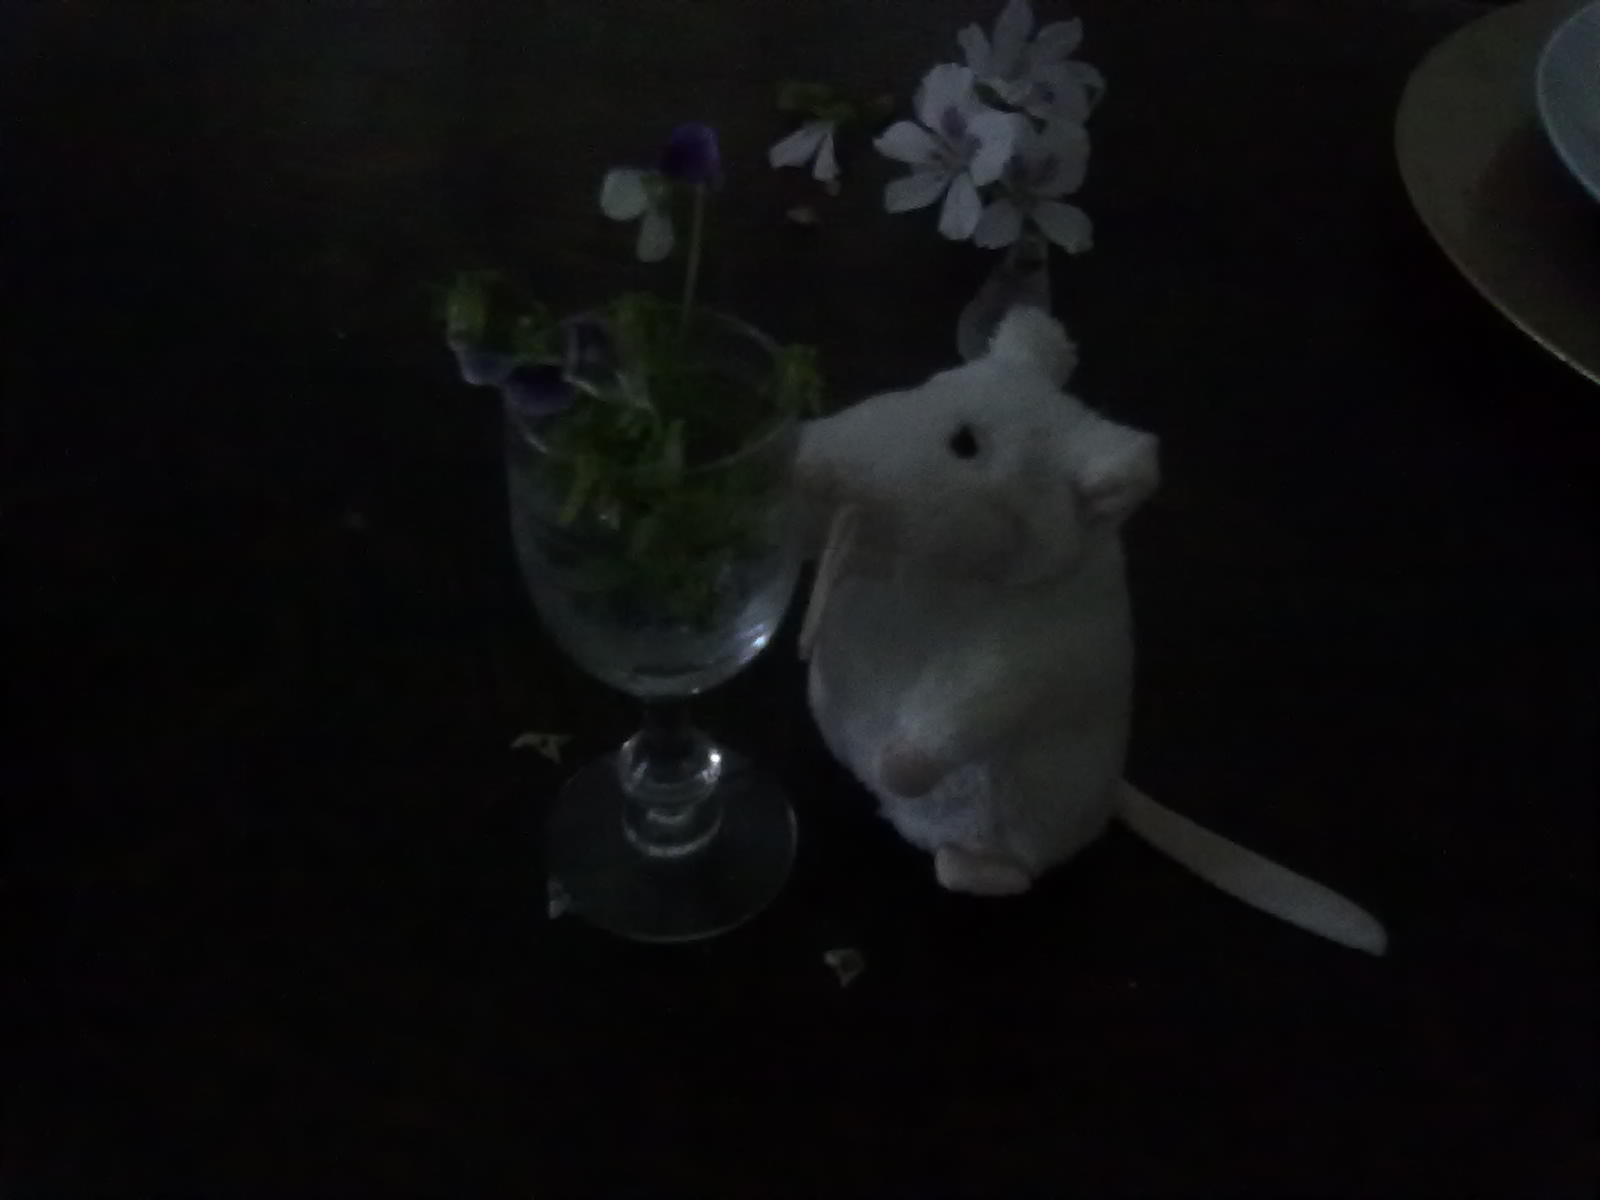 http://4.bp.blogspot.com/-QVETWZBBIc0/TohOaxSGMzI/AAAAAAAAQl4/VcNTrgJ9em8/s1600/ratinho%2Be%2Bcopo%2Bflores.jpg